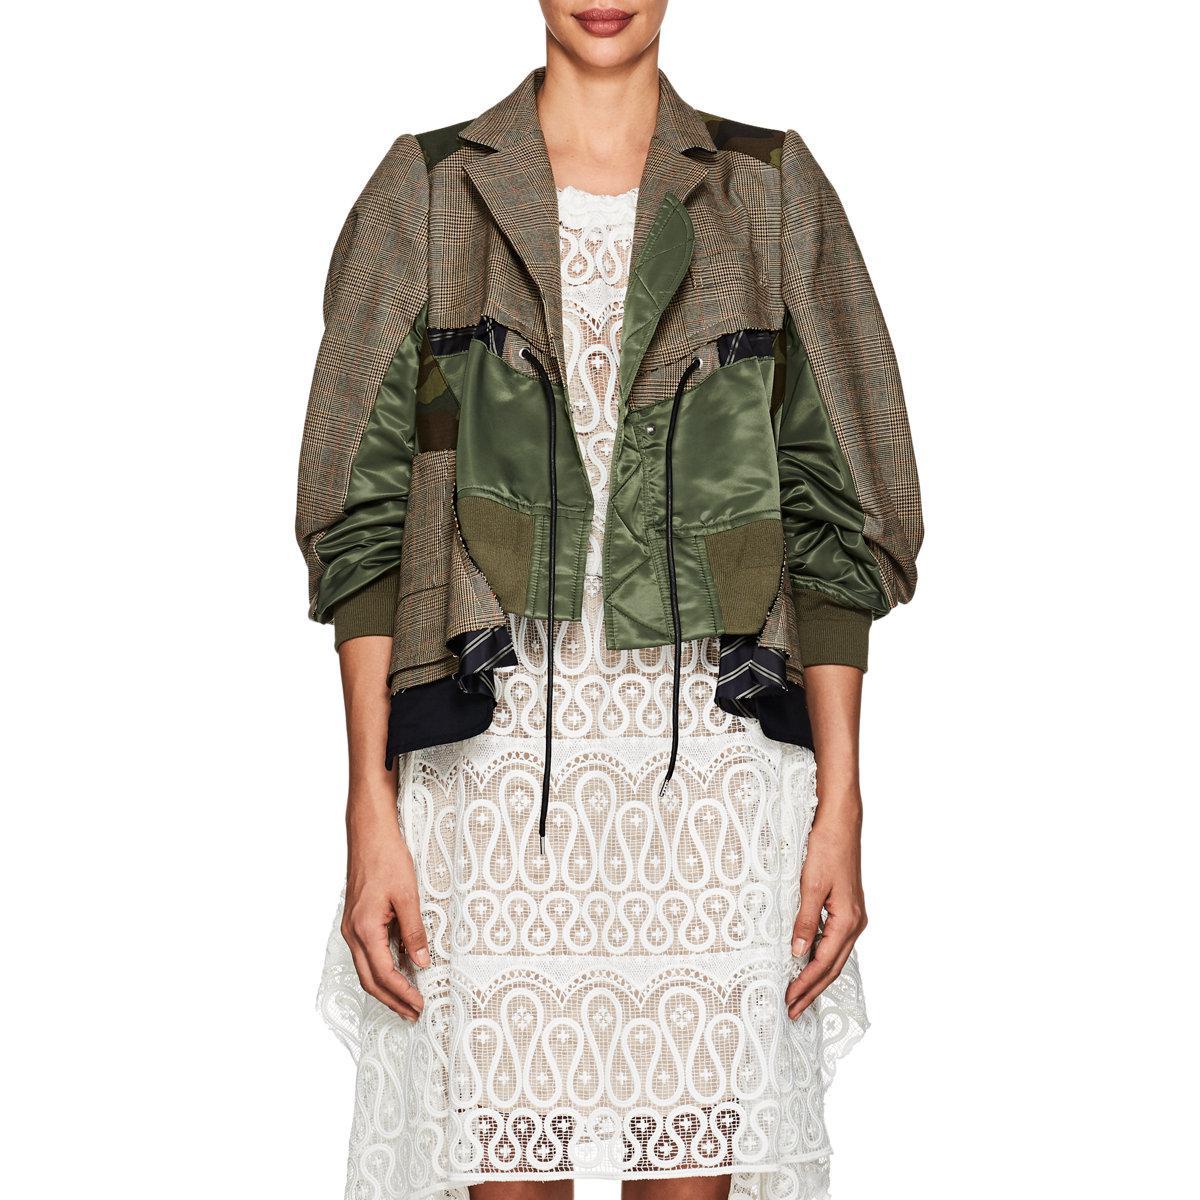 e6ff696b7ec7c Lyst - Sacai Glen Plaid & Camouflage Patchwork Jacket in Natural